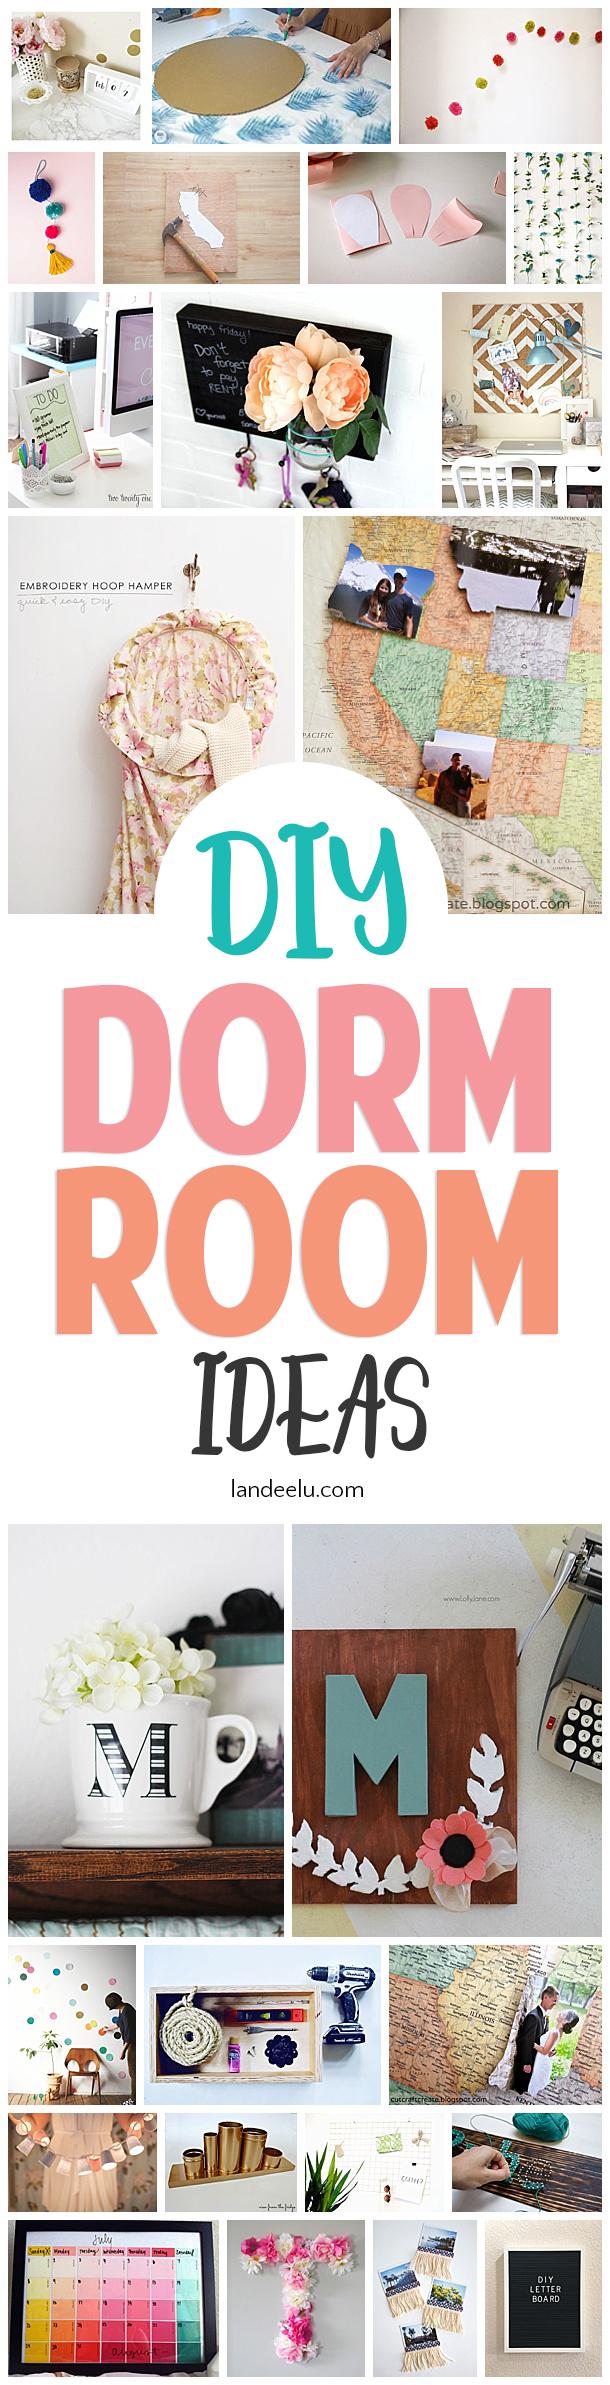 Super fun DIY dorm room ideas! #diydormroomideas #dormroom #collegedorms #diyprojects